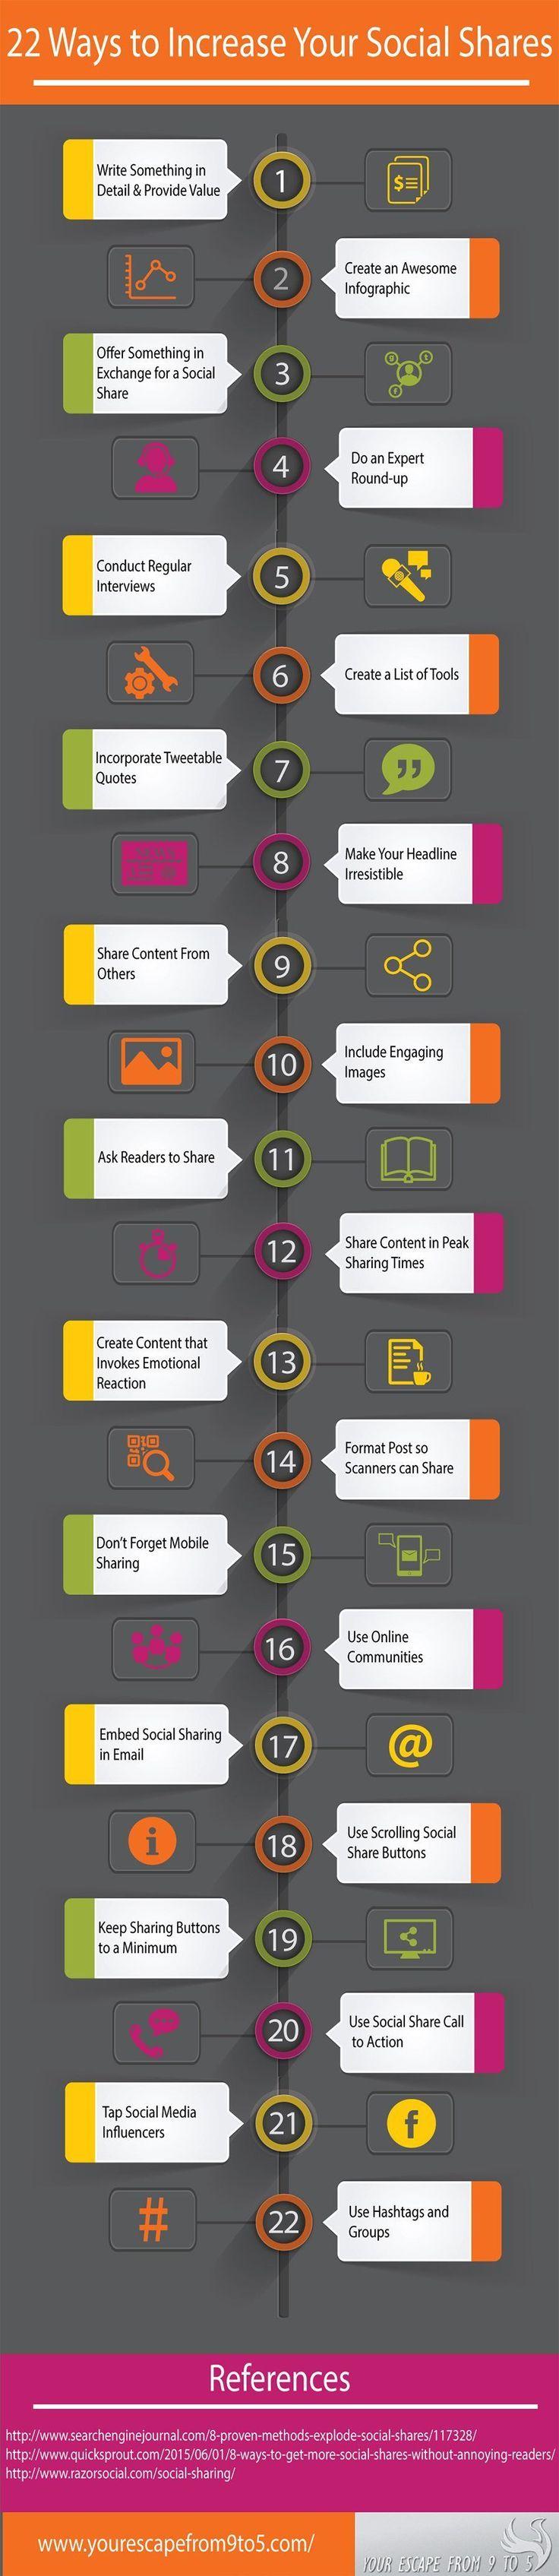 22 Ways to Increase Social Shares on Your Website or Blog [Infographic] #socialmediamarketingtips #socialmediamarketingstrategy